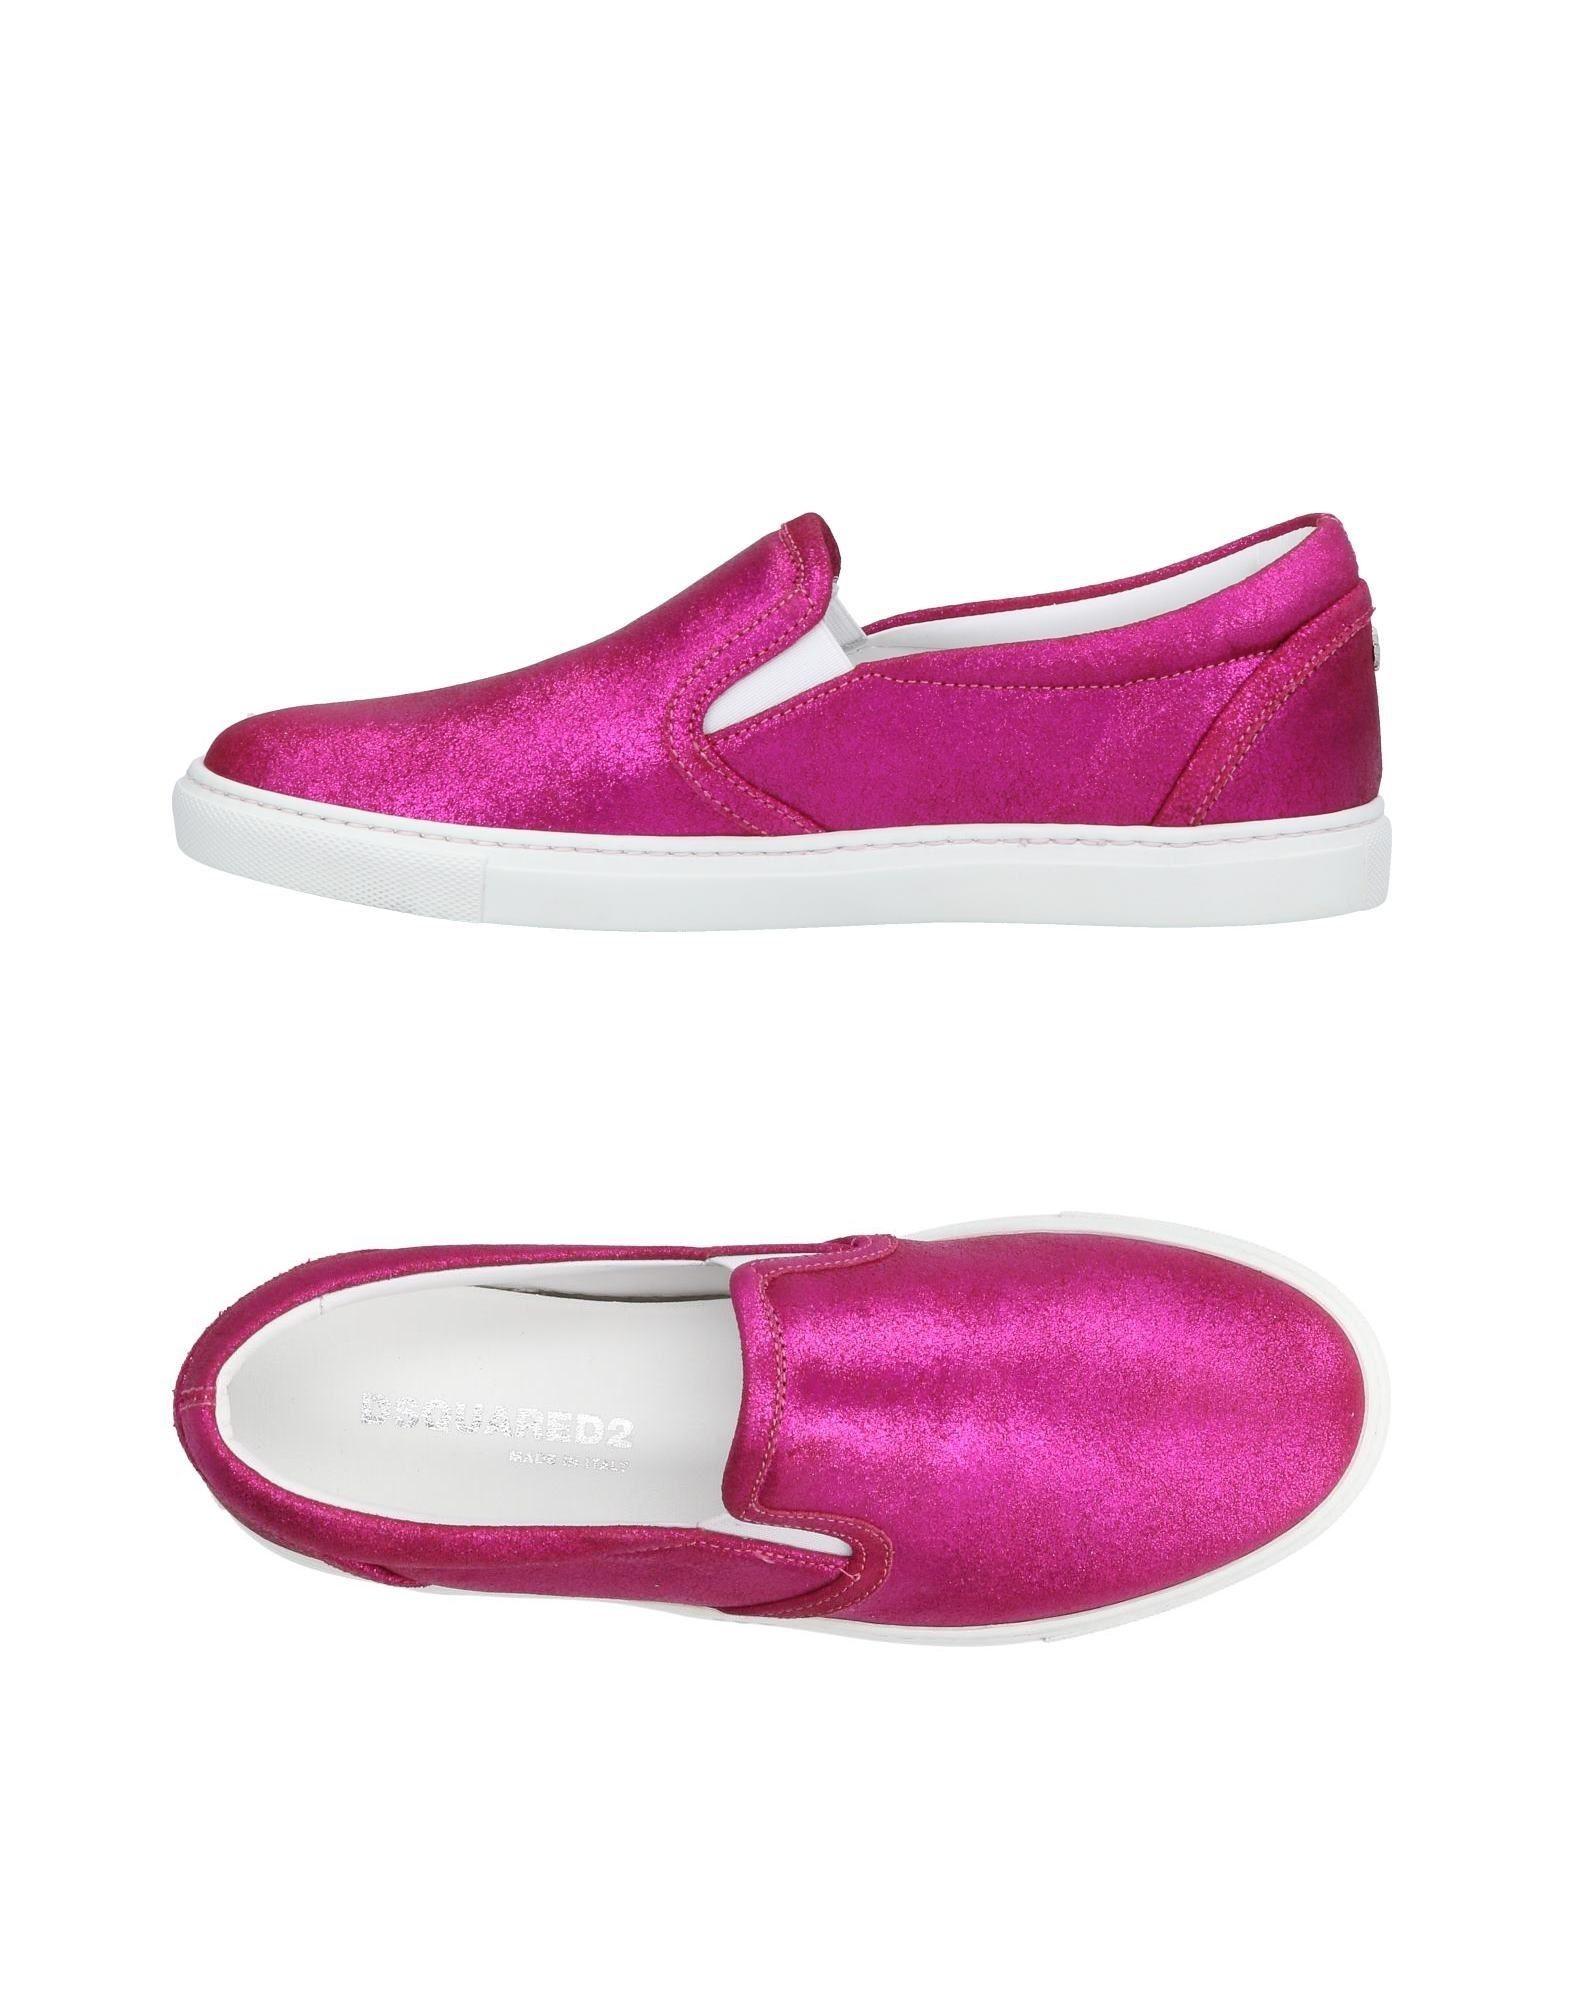 Moda Sneakers Dsquared2 Donna - 11423066AF